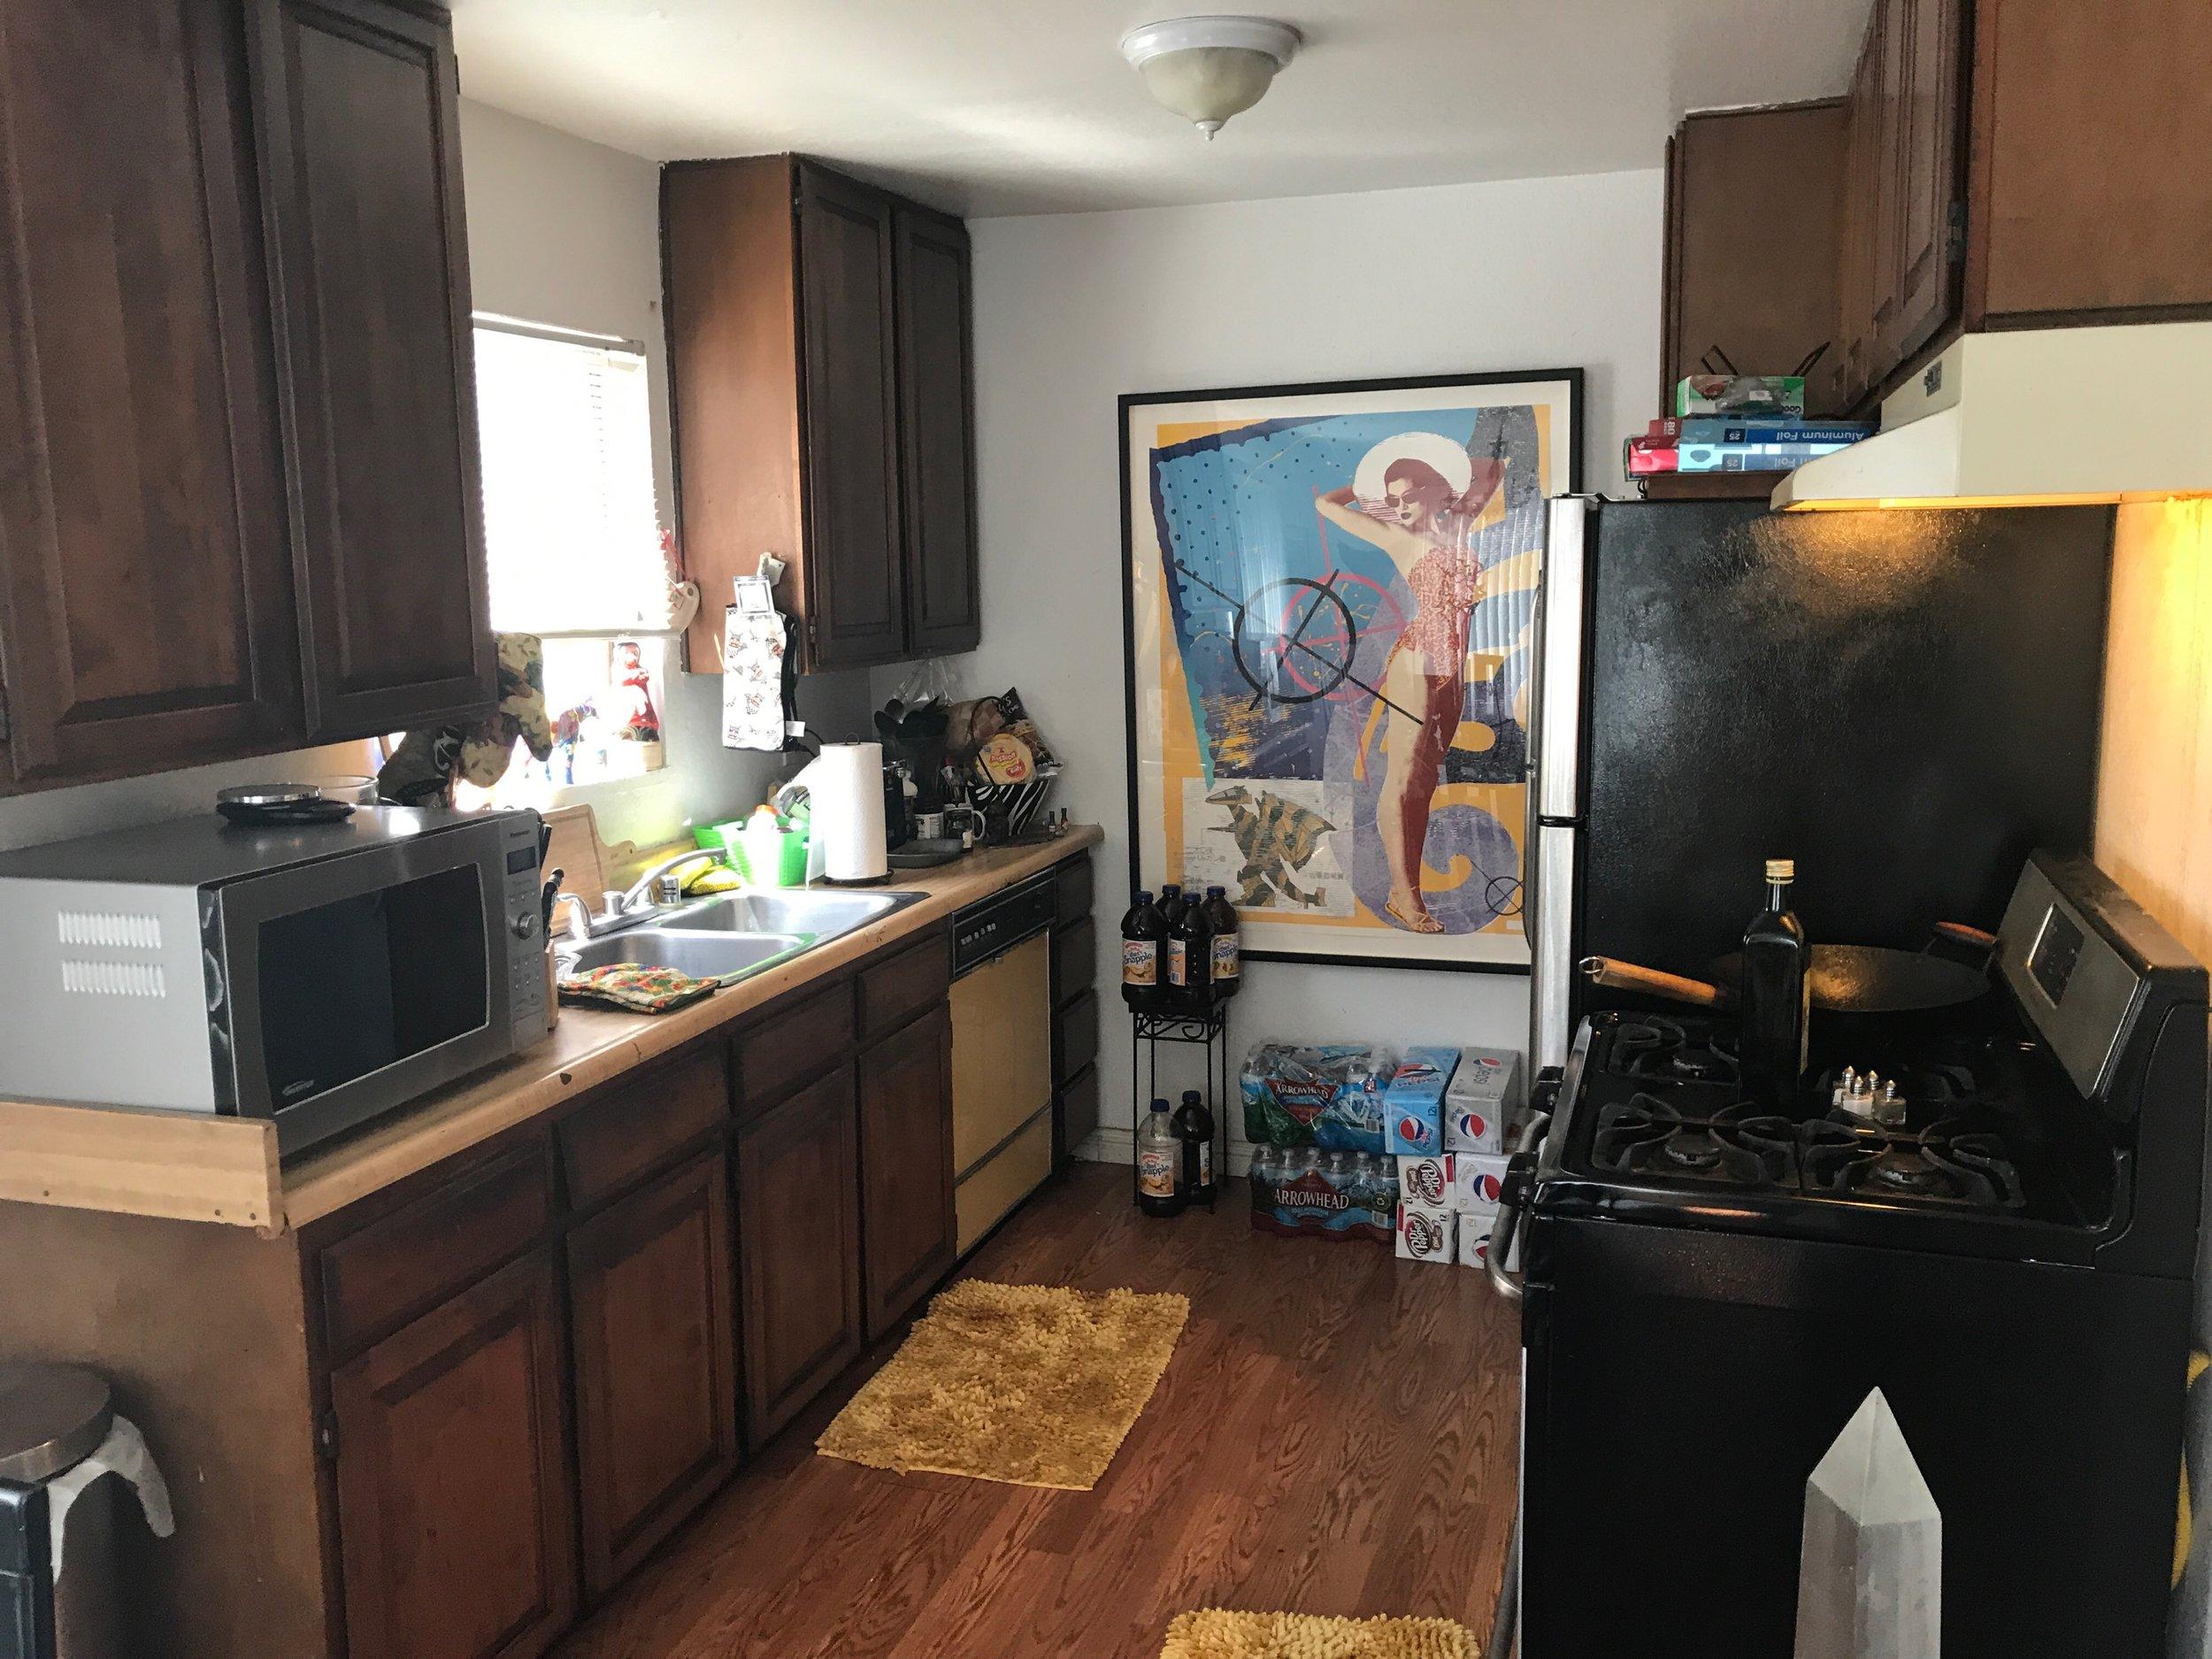 Sell your Silver Lake home - Silver Lake Realtor - Realtor David Bramante IMG_3002.JPG.jpeg